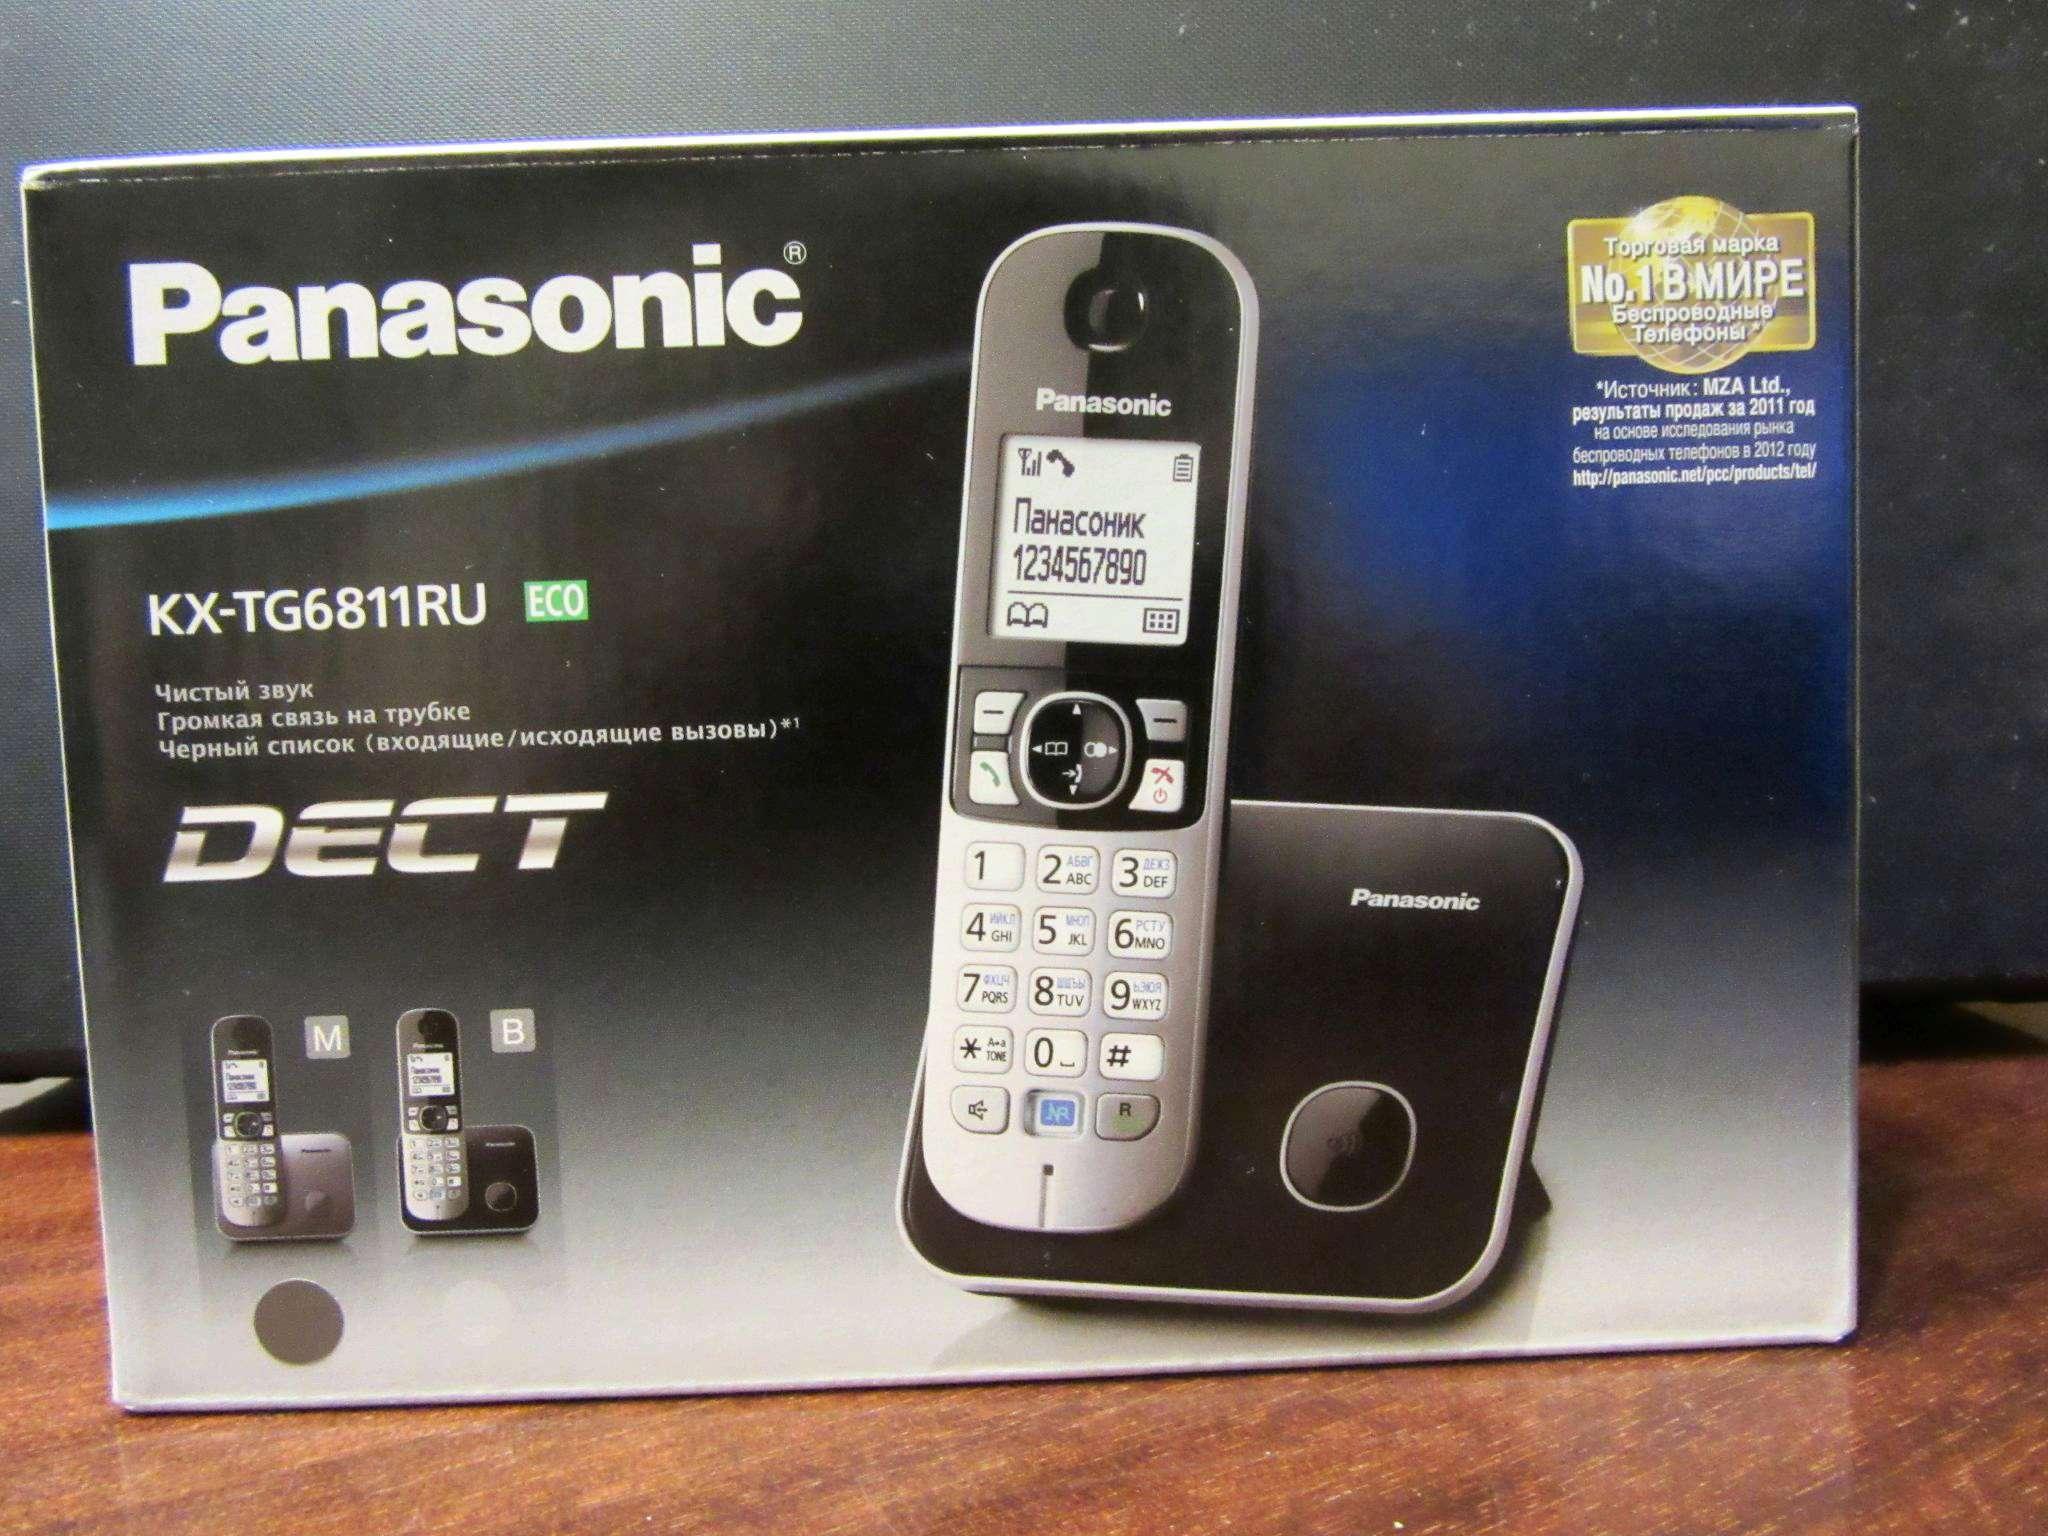 Ремонт радио телефона панасоник онлайнi - ремонт в Москве philips xenium w732 чехол купить